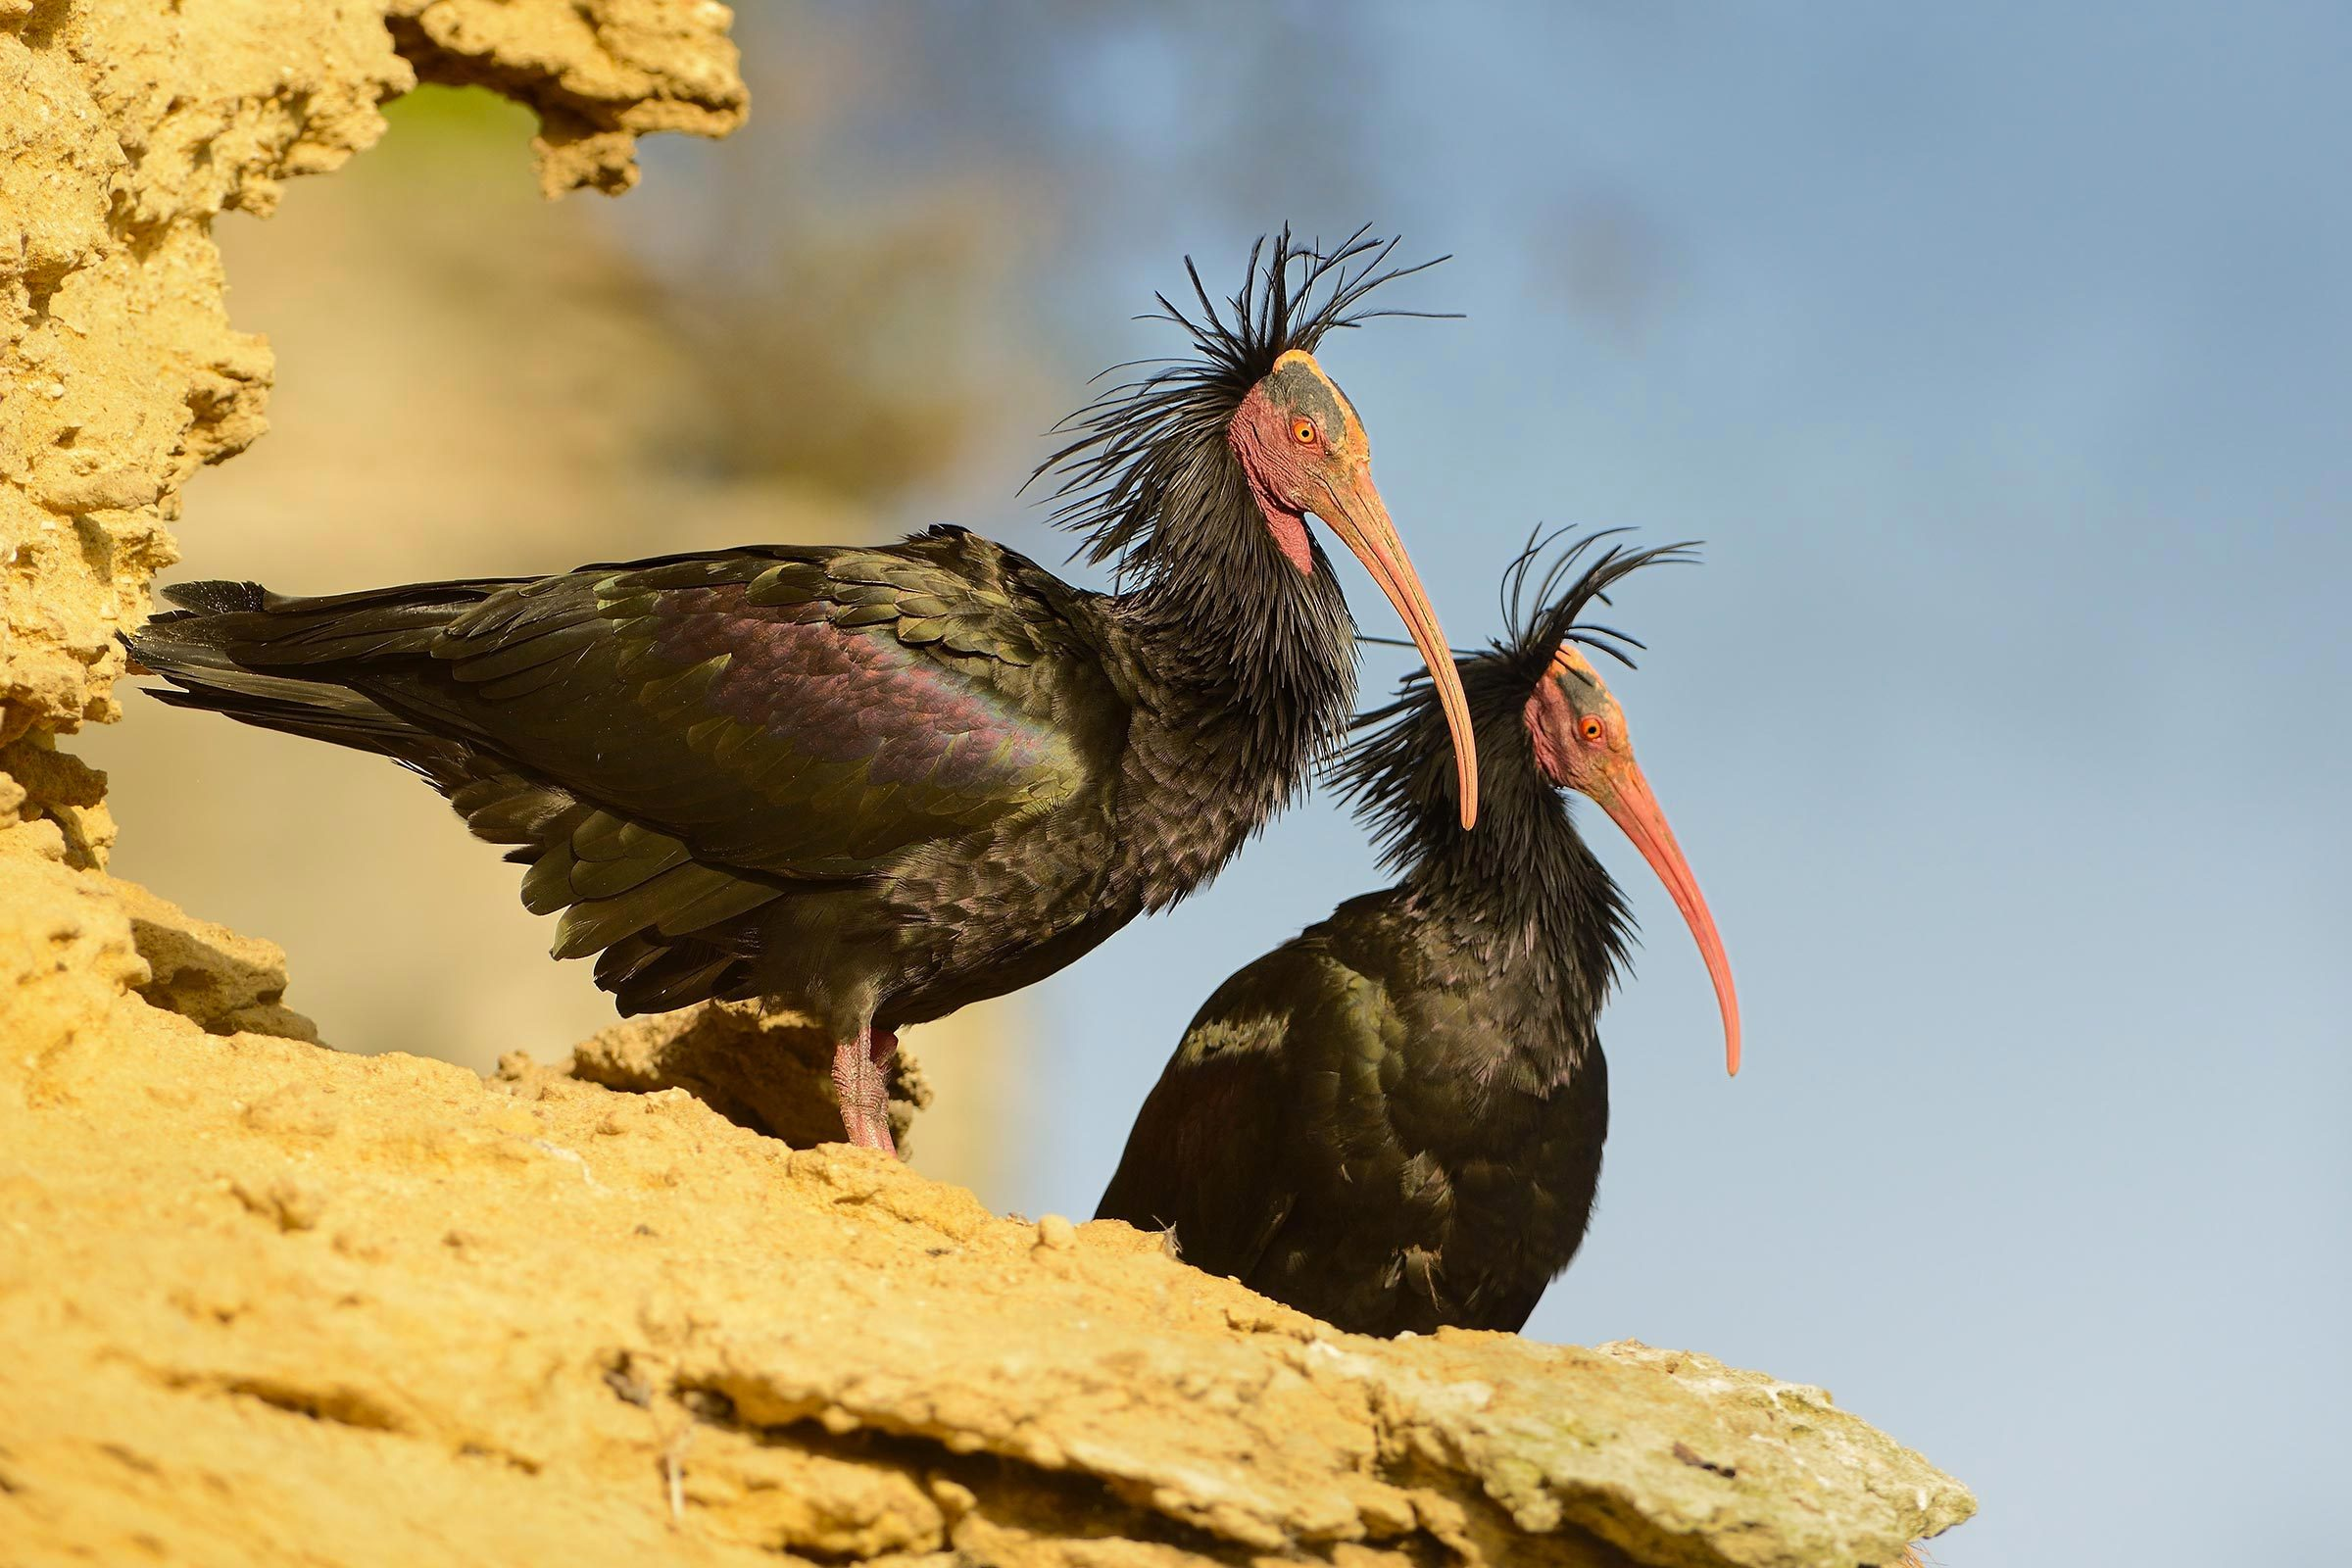 Espèces menacées : ibis chauve (Geronticus eremita)